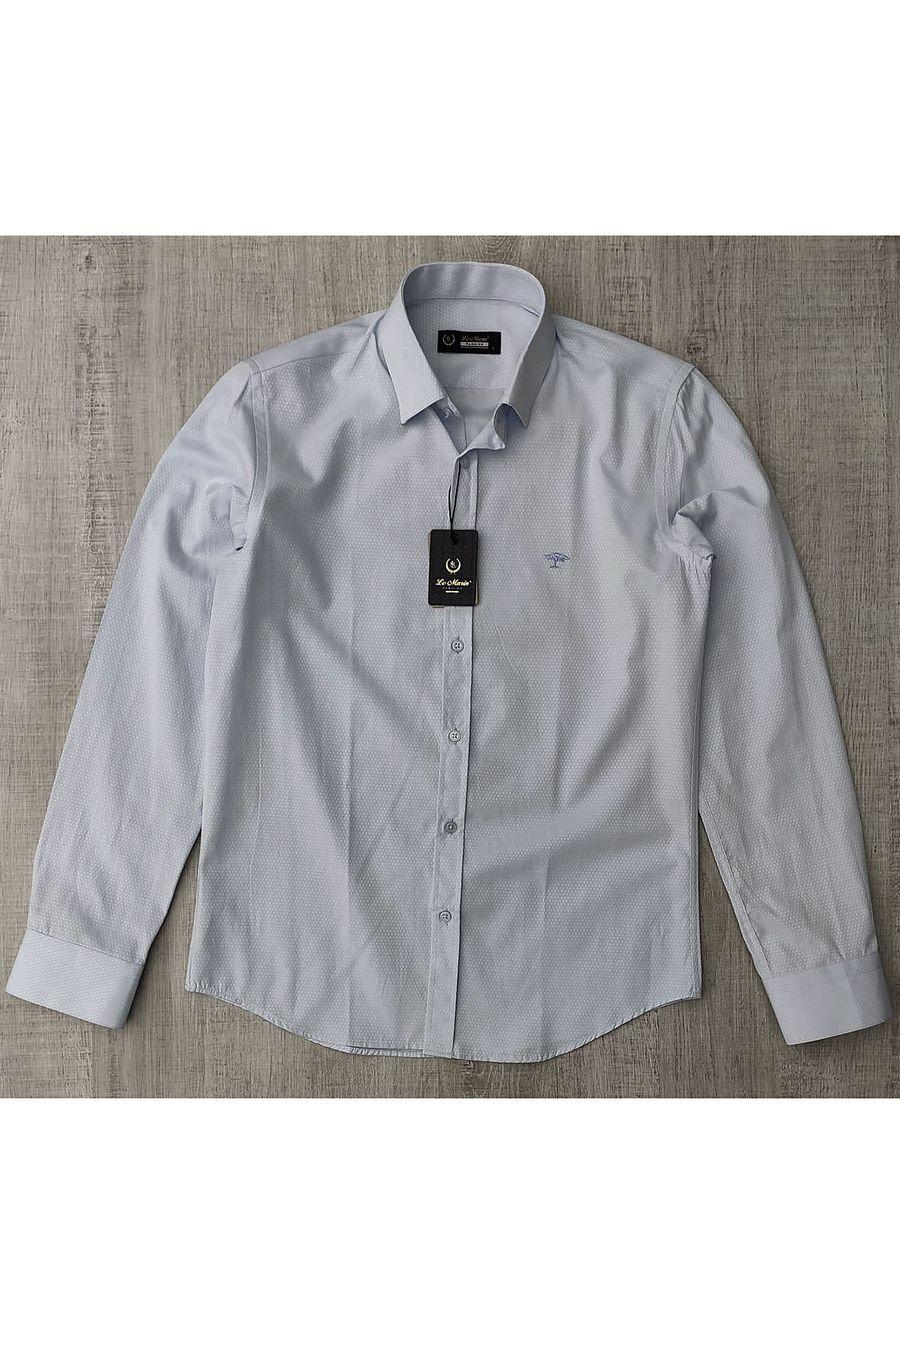 Рубашка мужская Le Marin 305-5 - фото 1